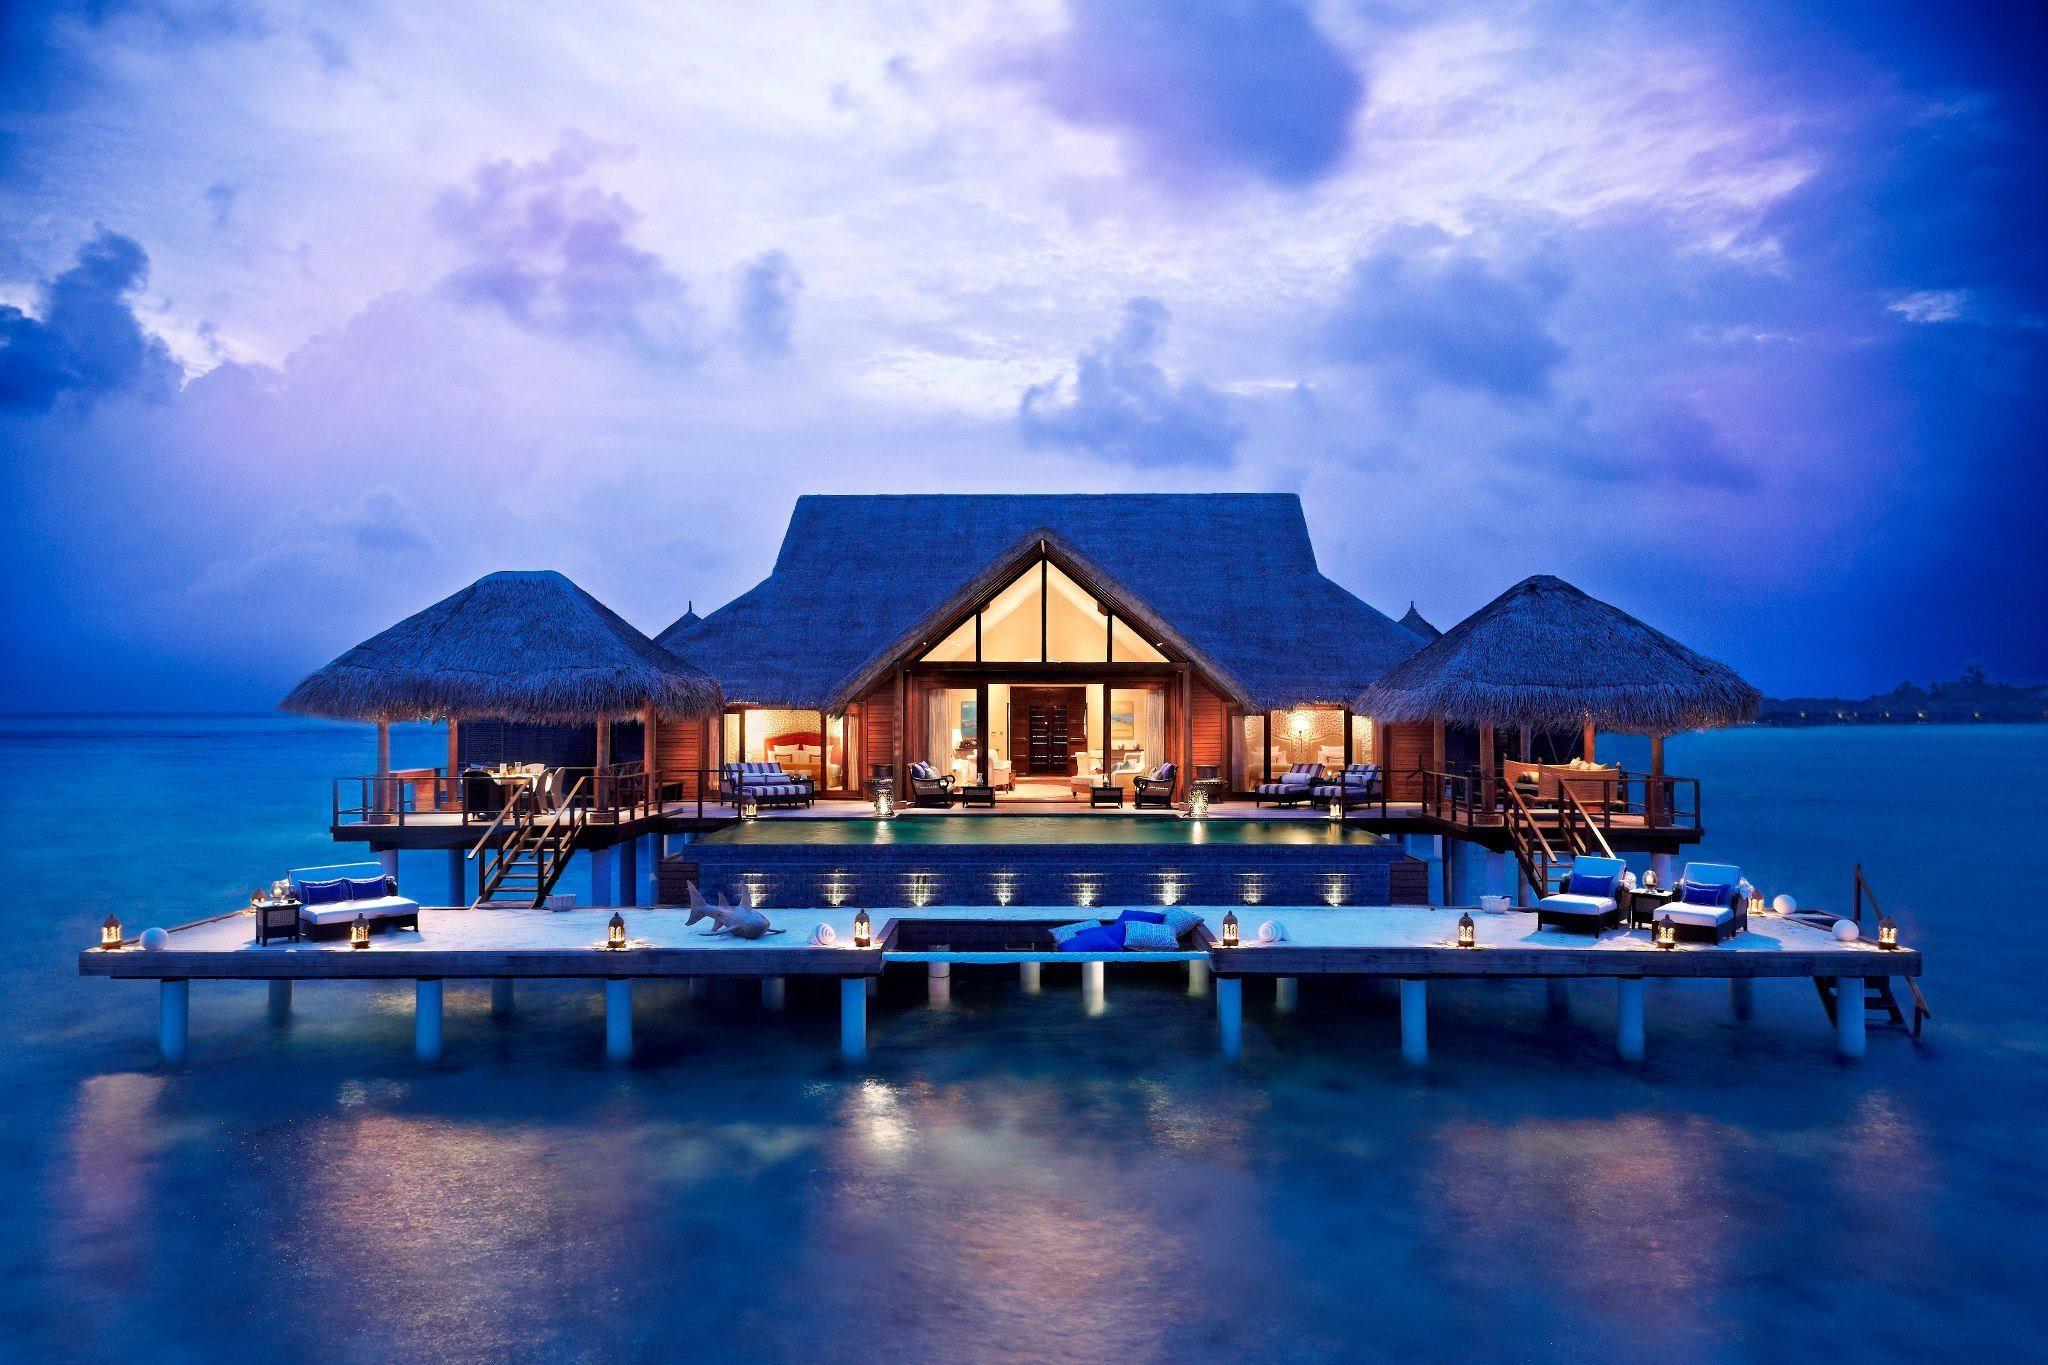 Taj Exotica Resort, Maldives | Maldives resort, Resort spa ...